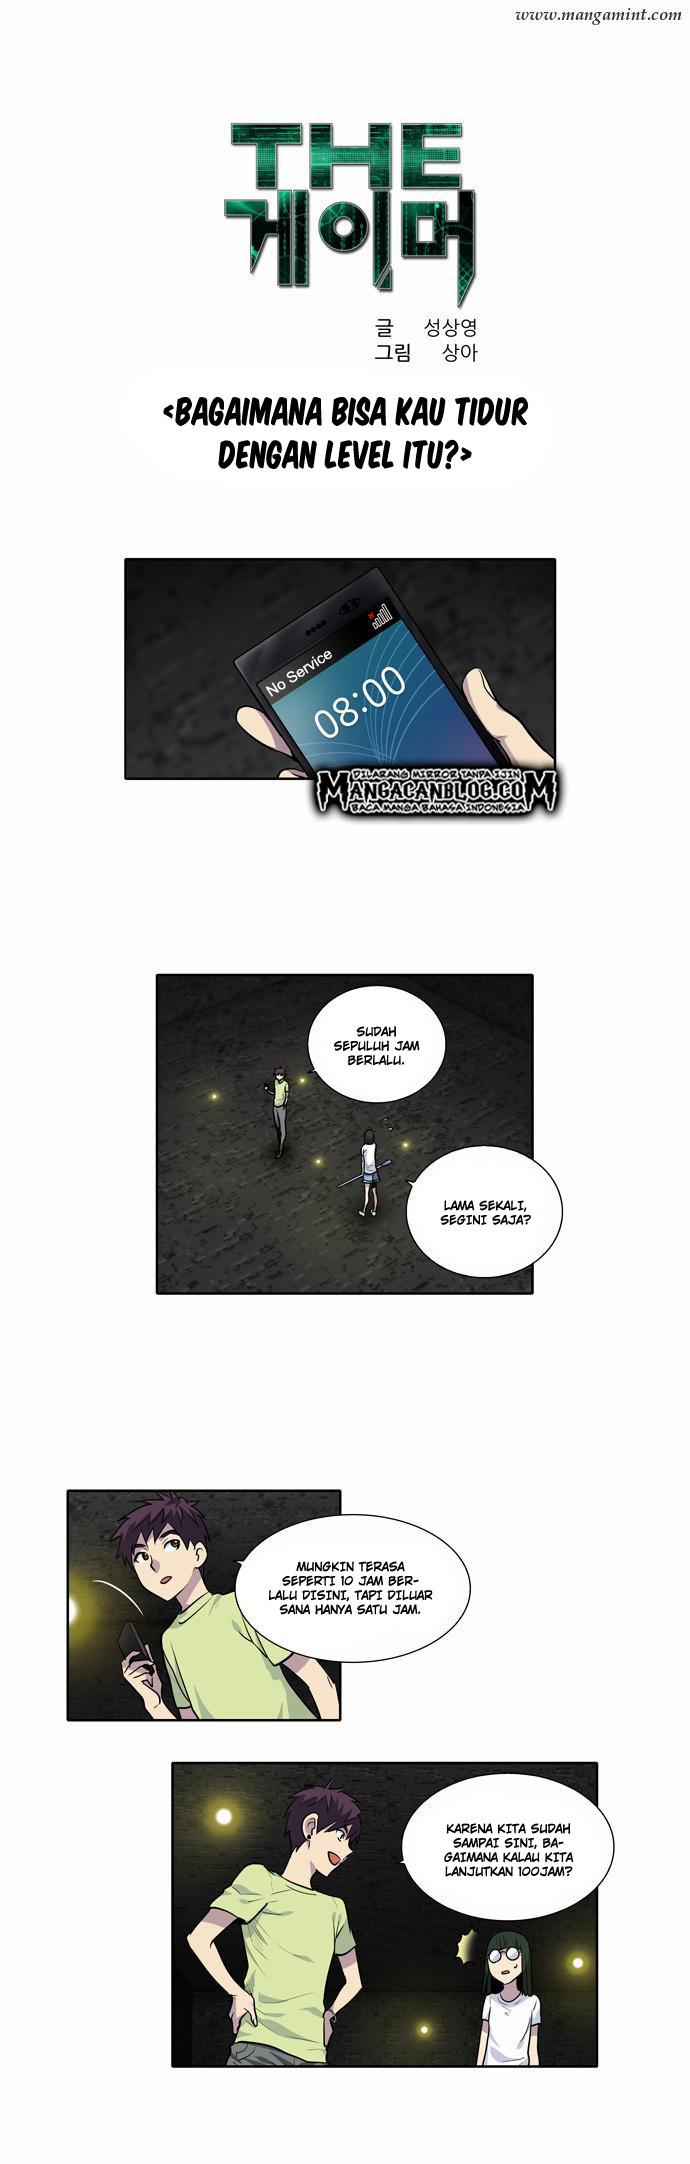 Dilarang COPAS - situs resmi www.mangacanblog.com - Komik the gamer 111 - bagaimana kau tidur dengan level itu? 112 Indonesia the gamer 111 - bagaimana kau tidur dengan level itu? Terbaru 1|Baca Manga Komik Indonesia|Mangacan